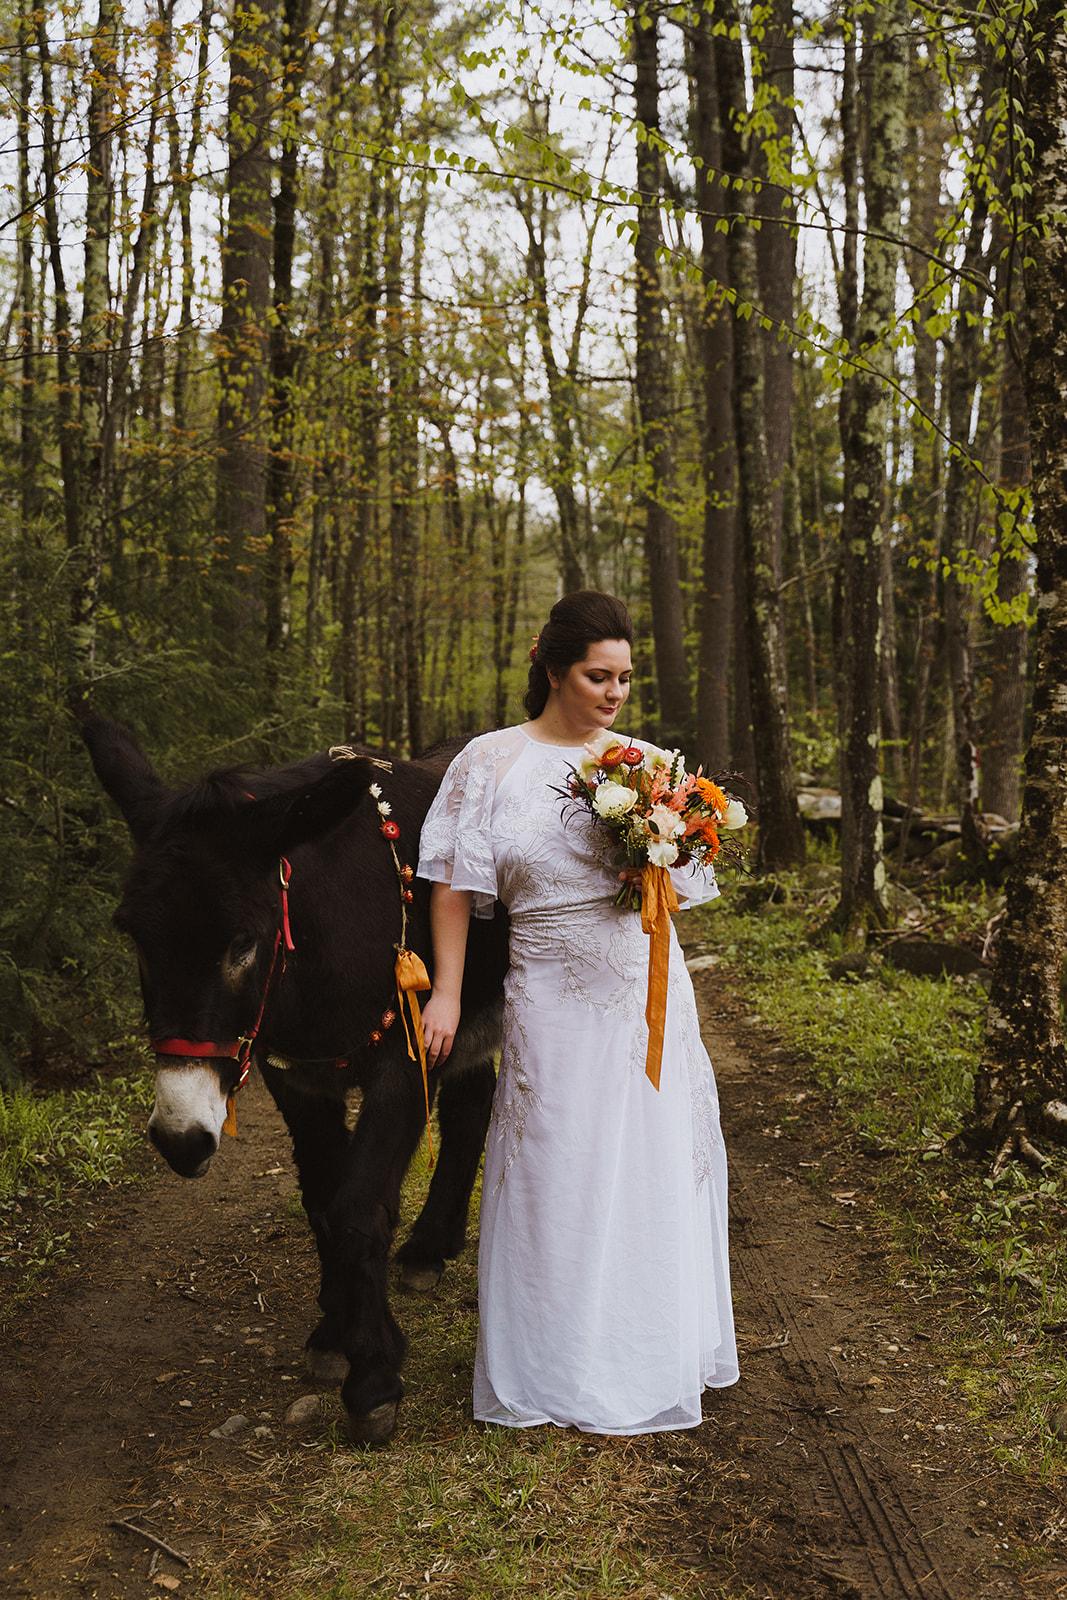 Tuckaway Tree Farm Lebanon Maine Wedding Inspiration 23